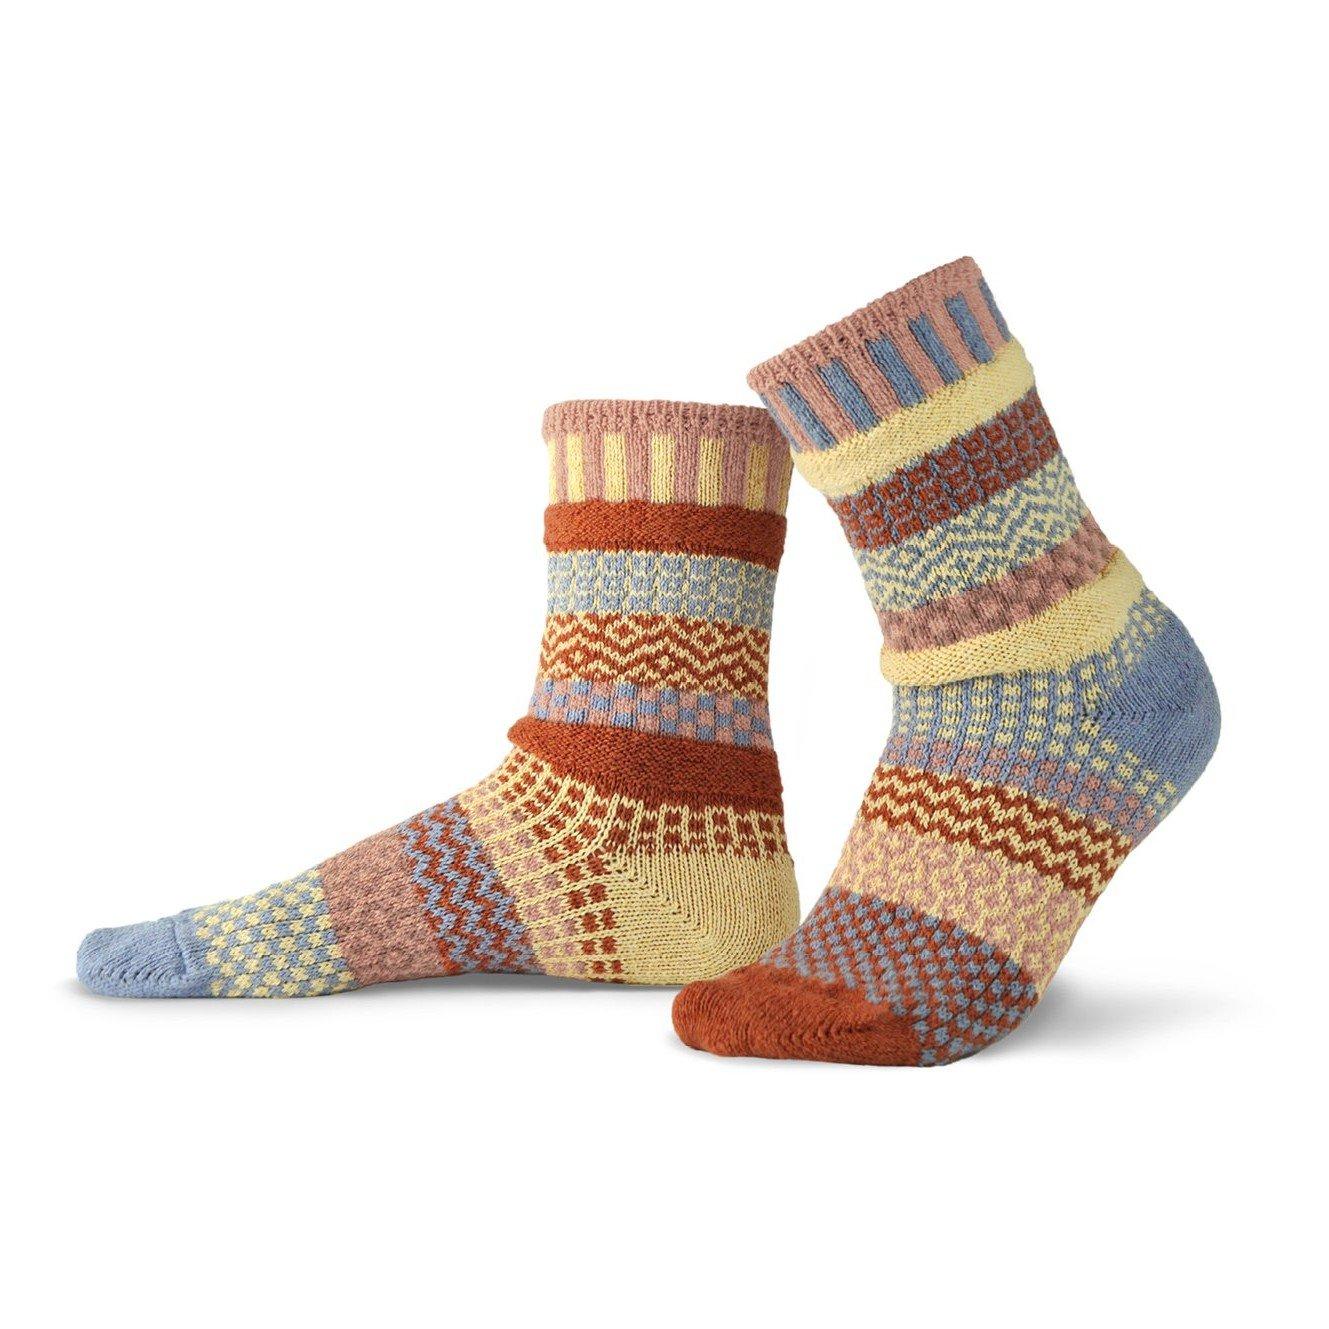 Sandstone Adult Crew Socks